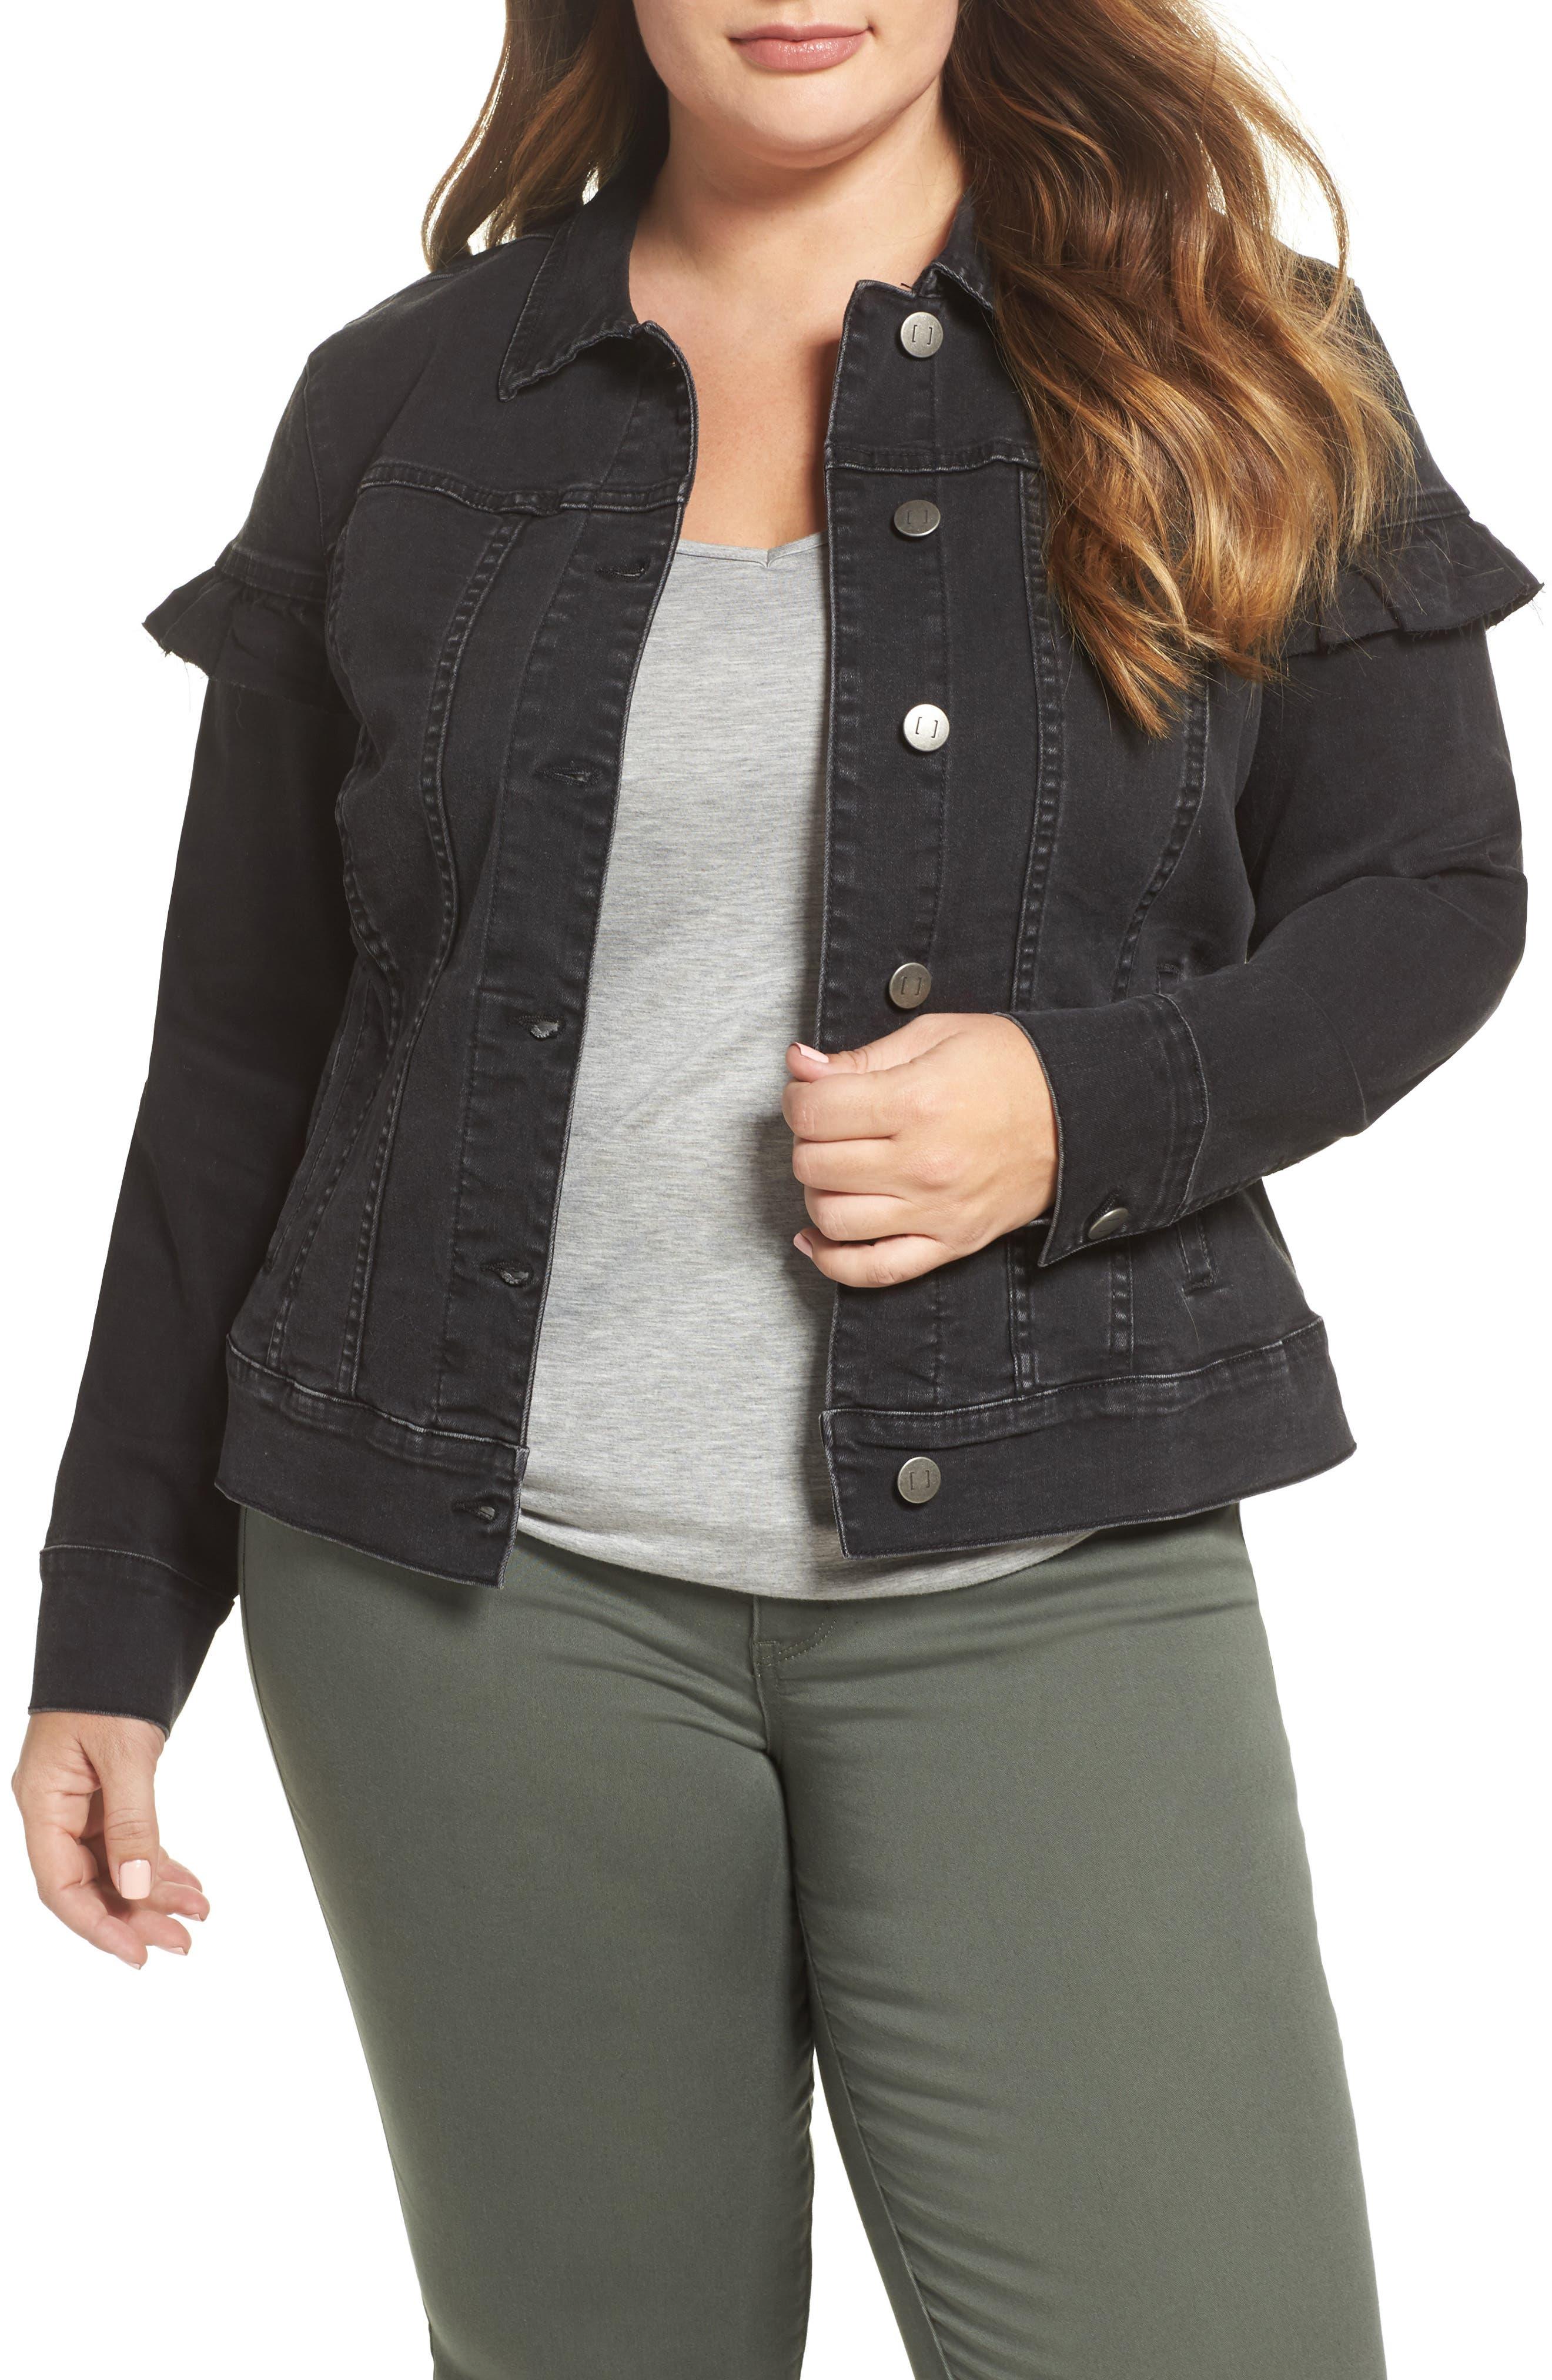 Katinka Denim Jacket,                         Main,                         color, Black